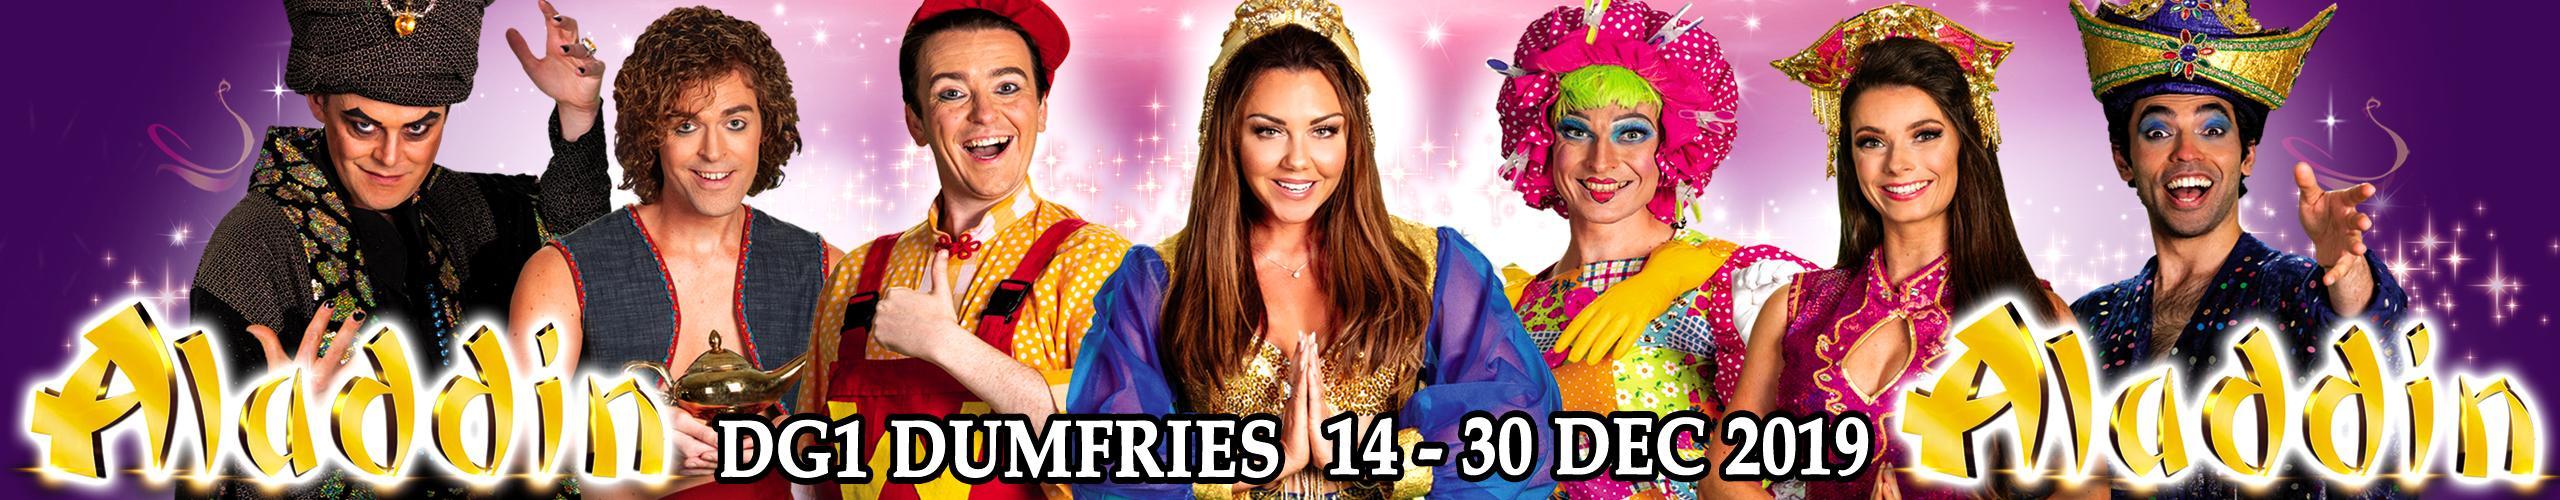 Aladdin Pantomine DG1 Dumfries